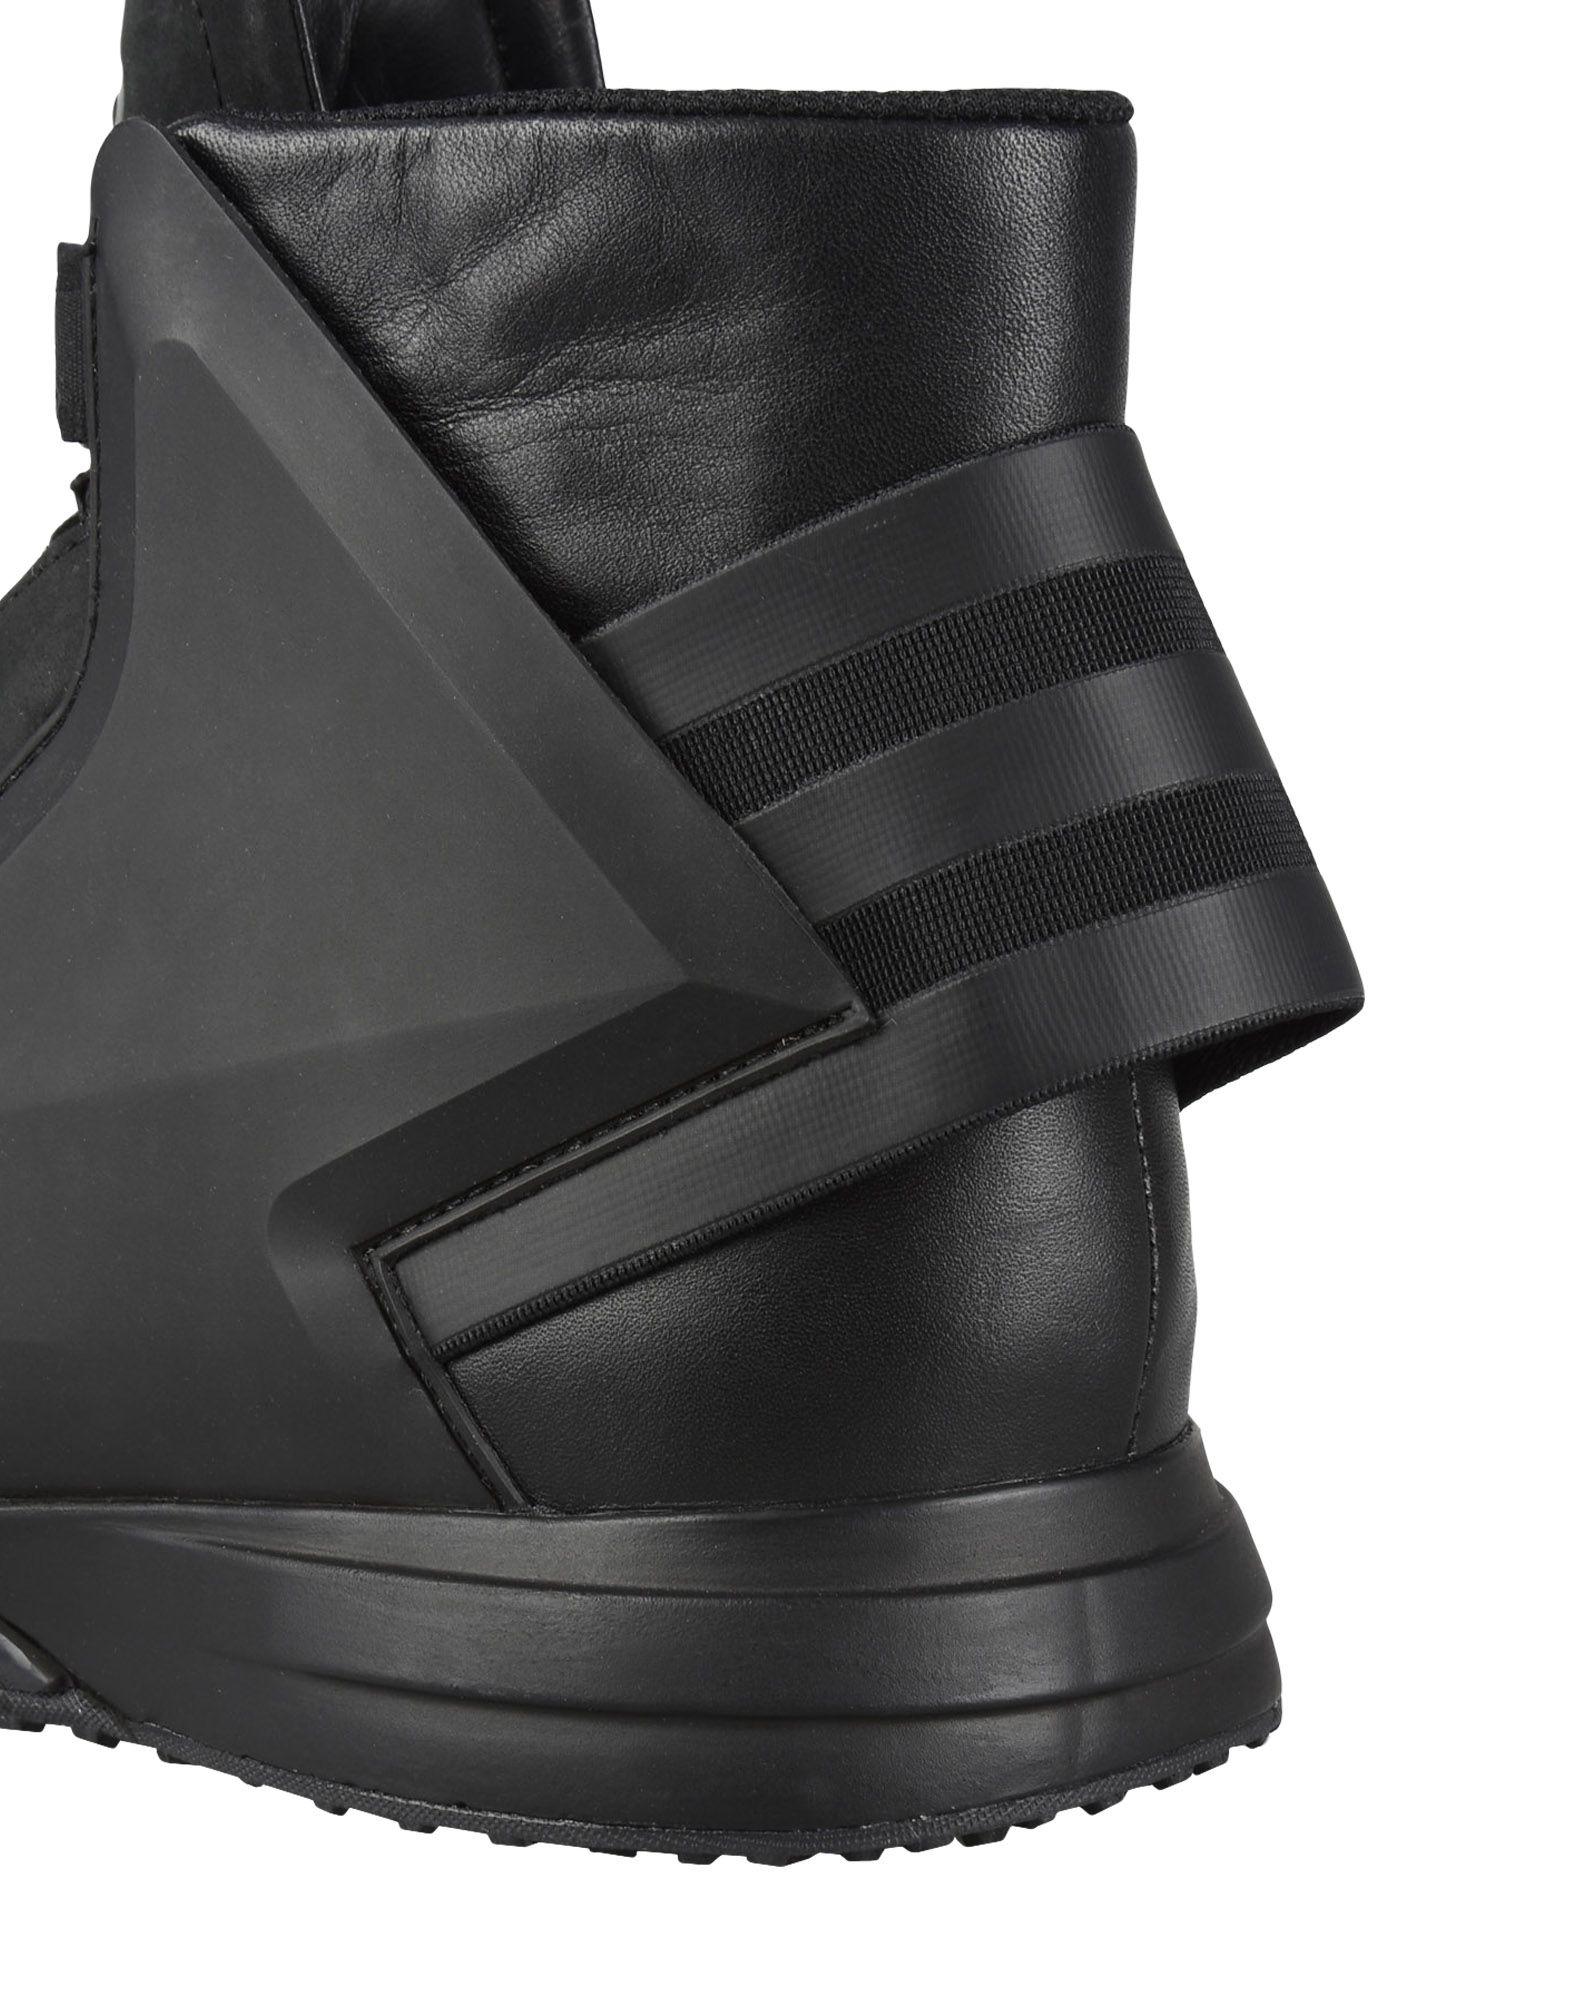 d36b861b5f742 YOHJI. YAMAMOTO. Y-3 Y-3 BBALL TECH High-top sneakers Man a ...